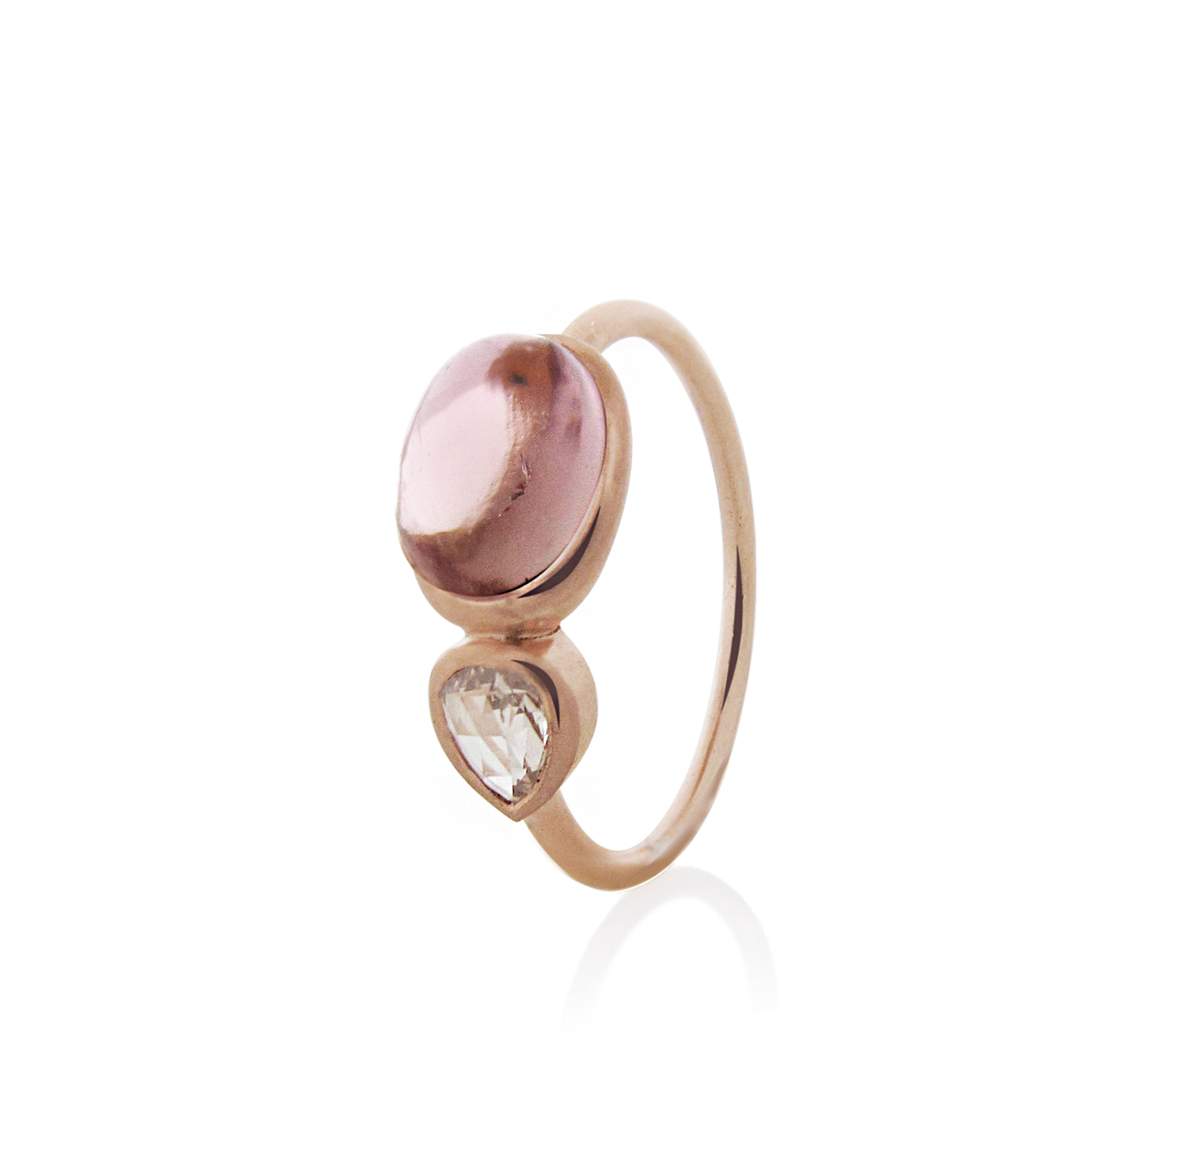 morethanthis-fine-jewelry-myrto-anastasopoulou-flirt-RG031